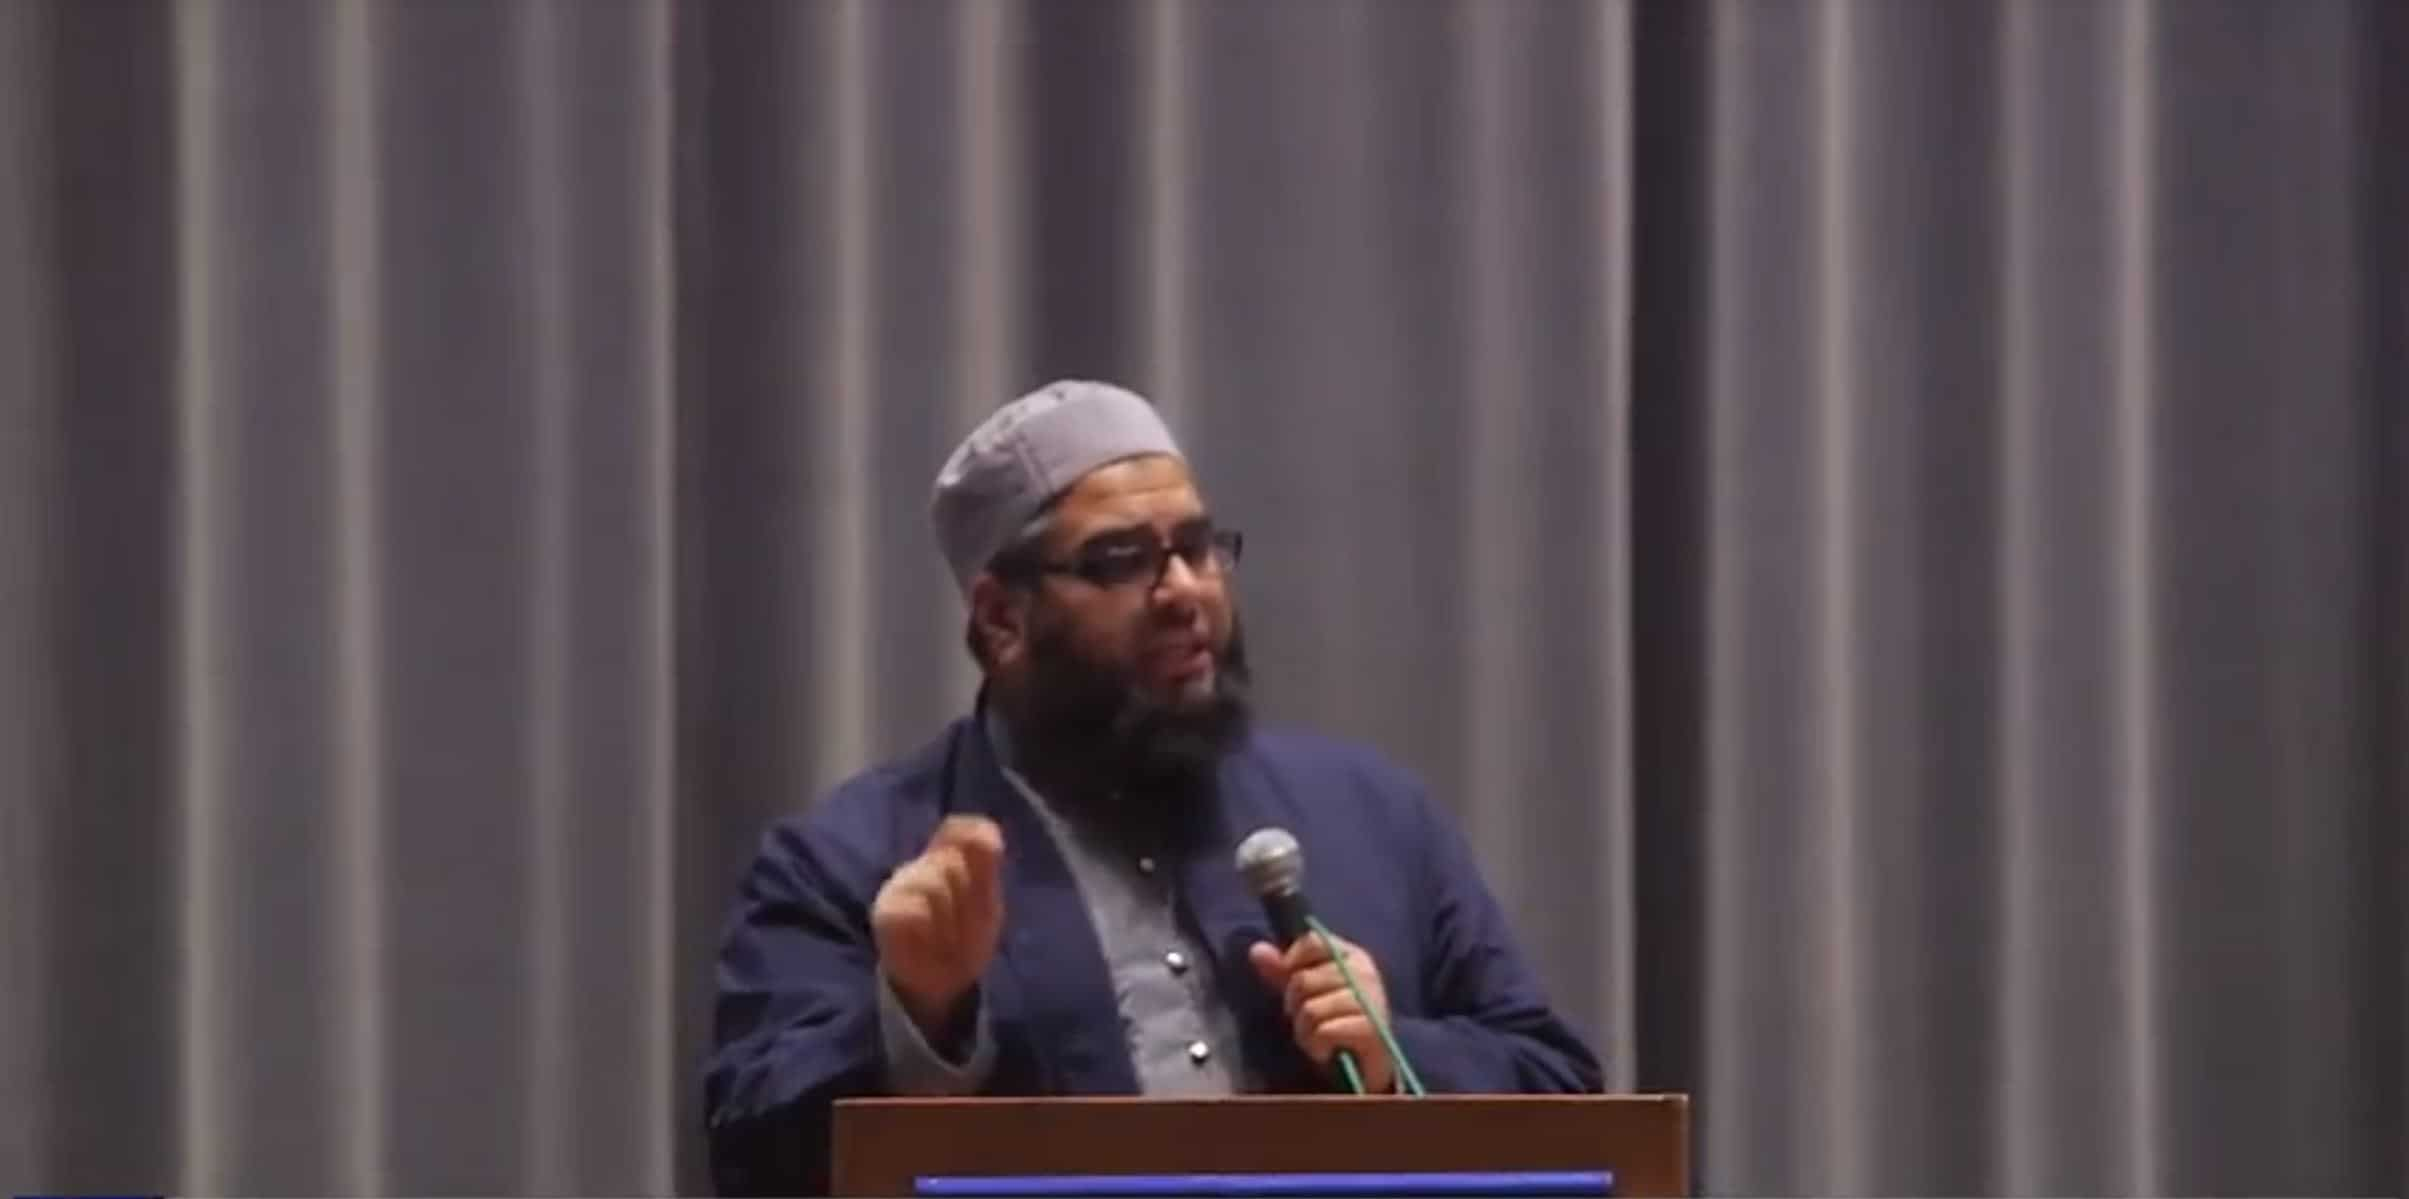 Abdul Nasir Jangda – Just Trust Him, He Has Plans